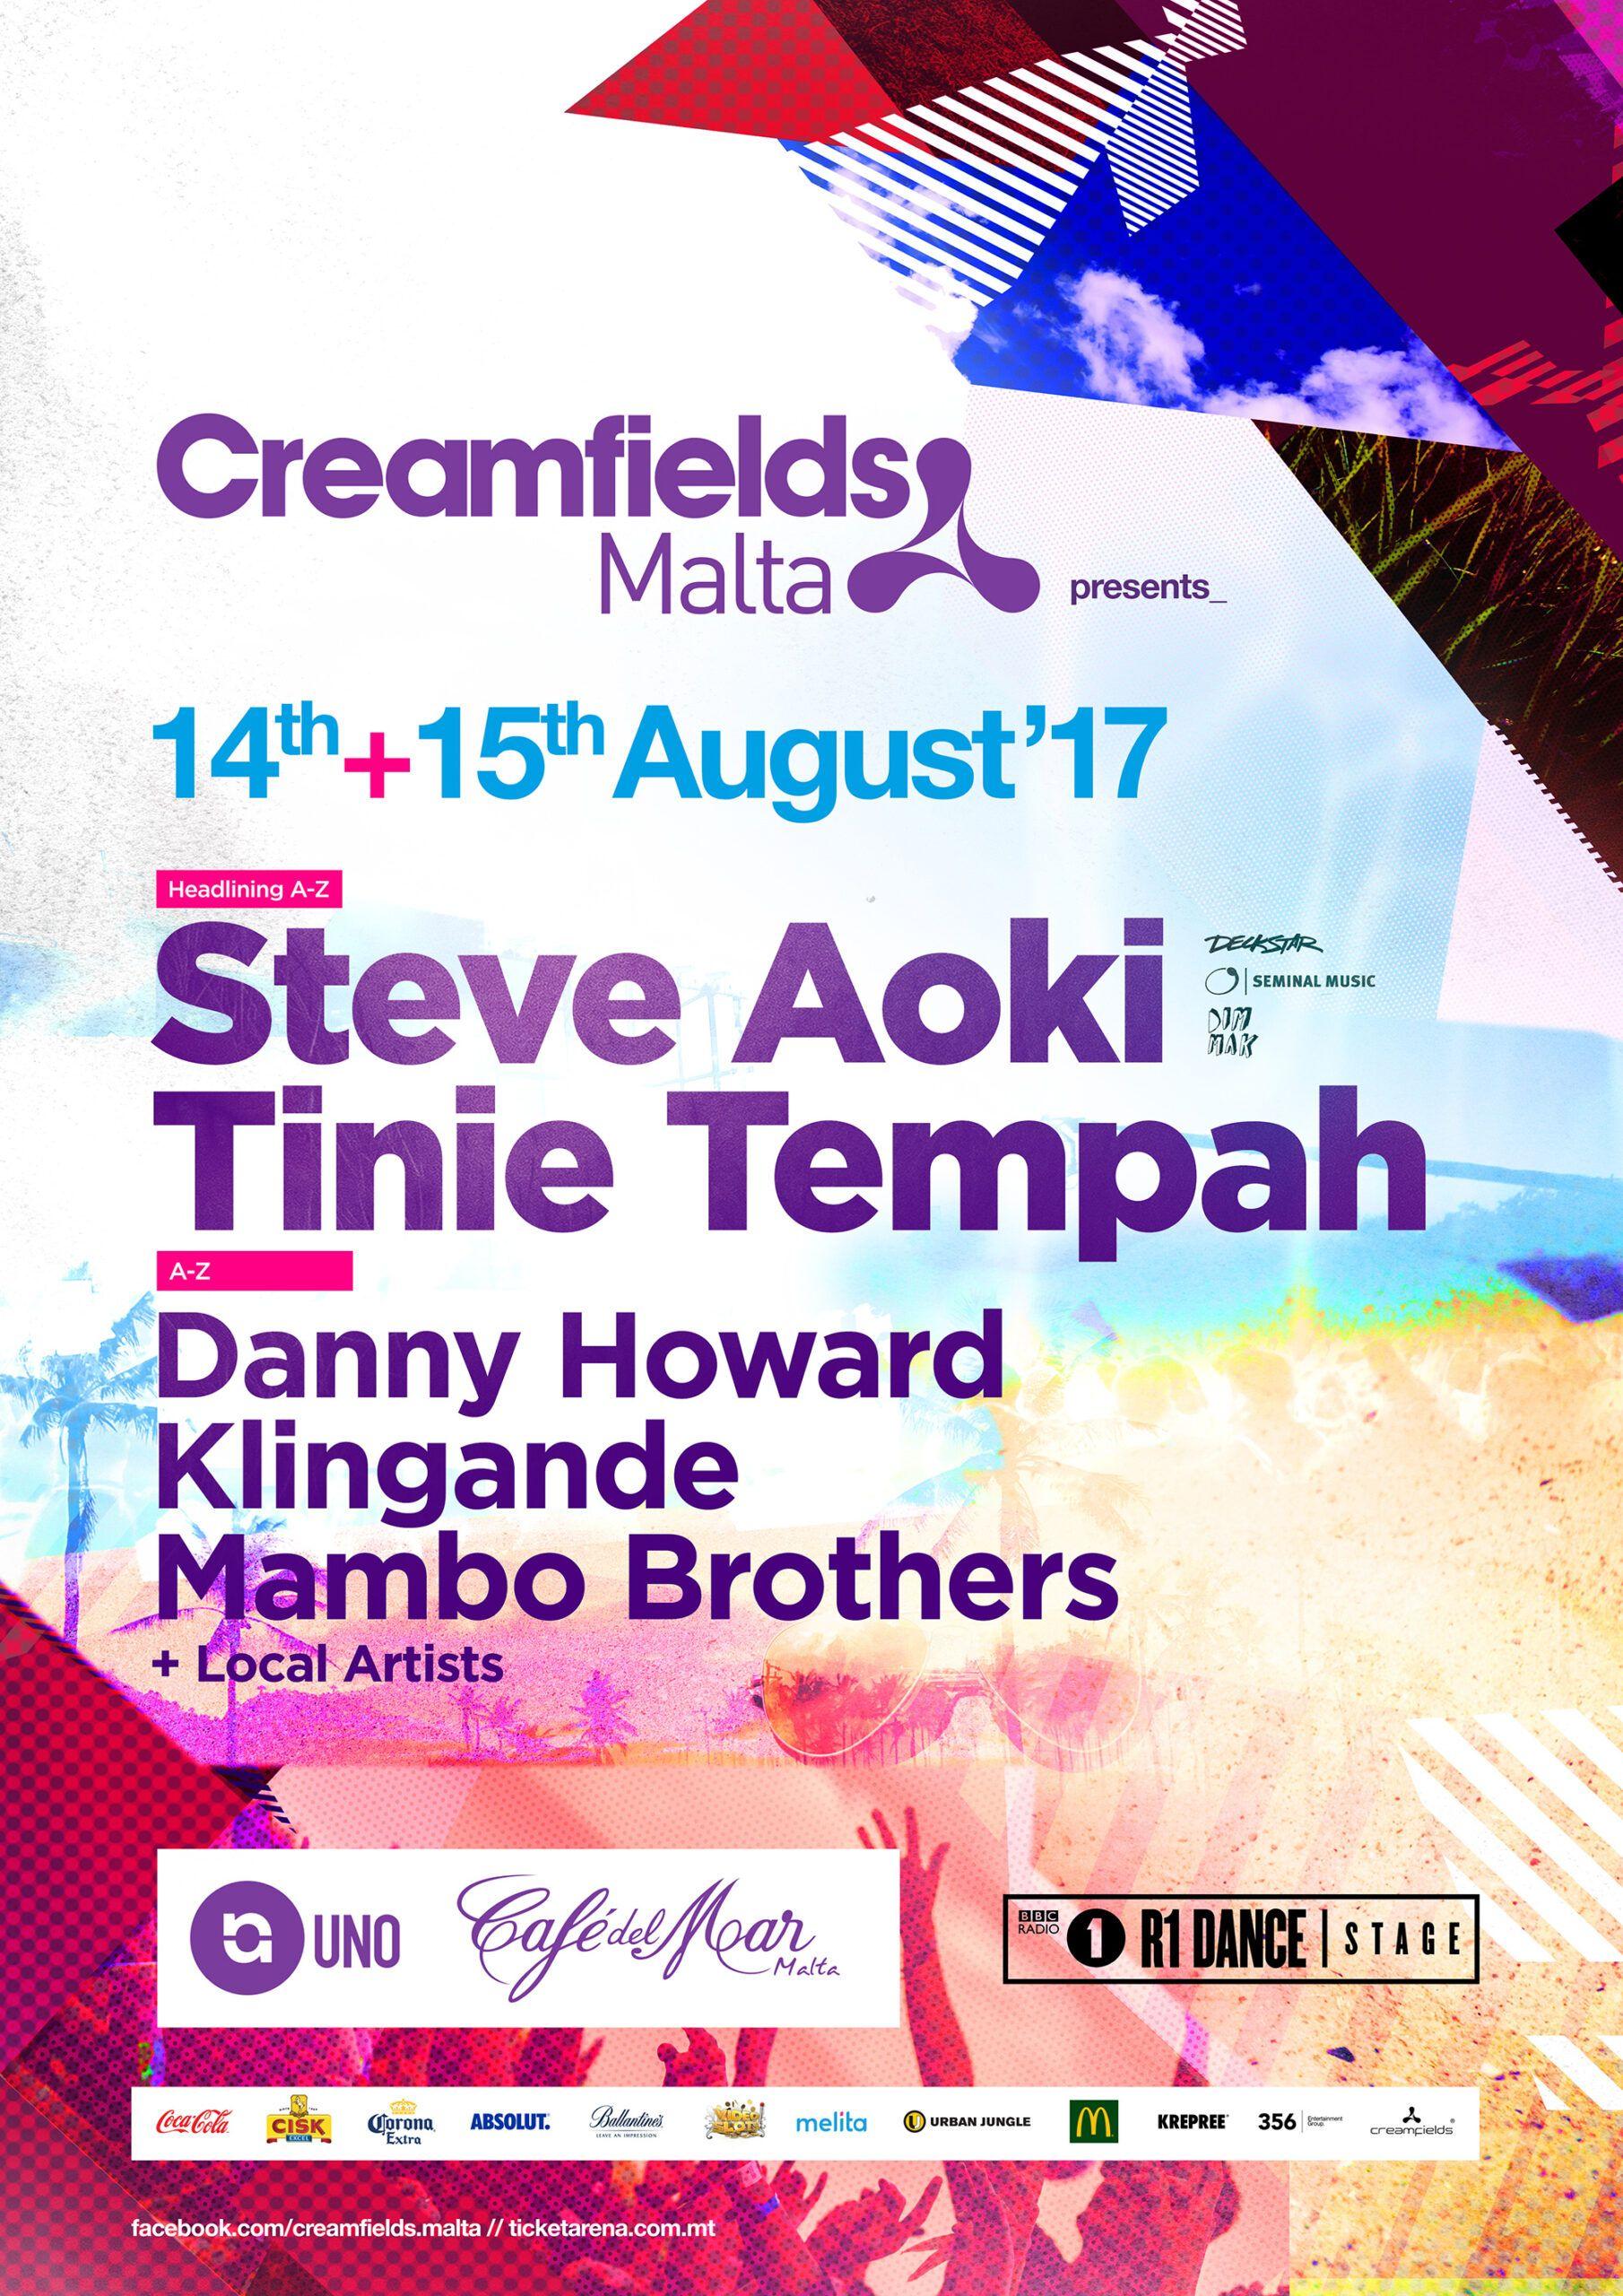 creamfields_postera3_3-1.jpg